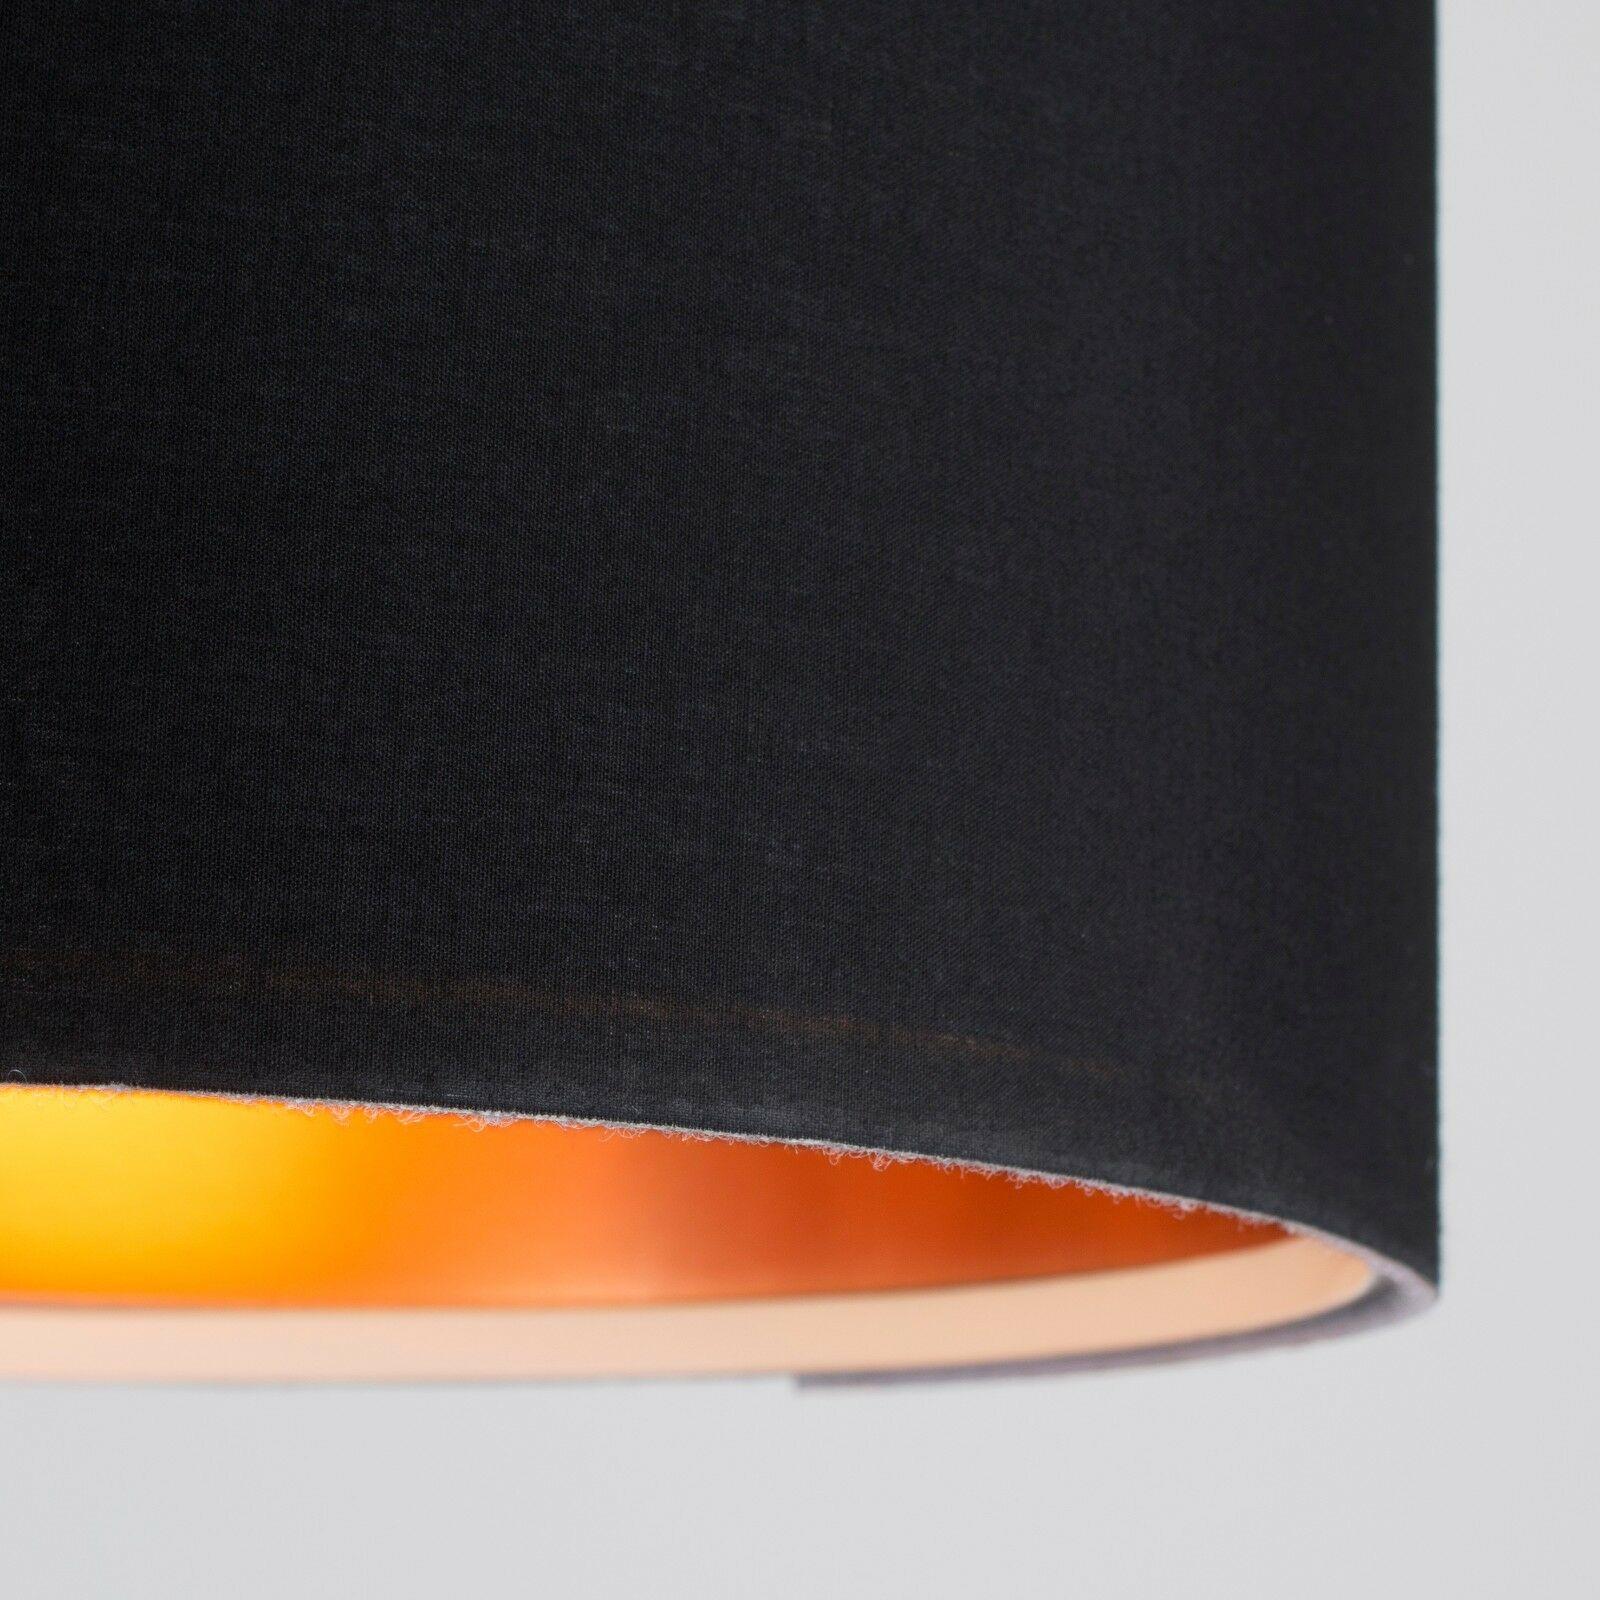 Tela-moderna-algodon-facil-ajuste-Techo-Colgante-Pantalla-De-Mesa-tonos-de-luz-de-tambor miniatura 35